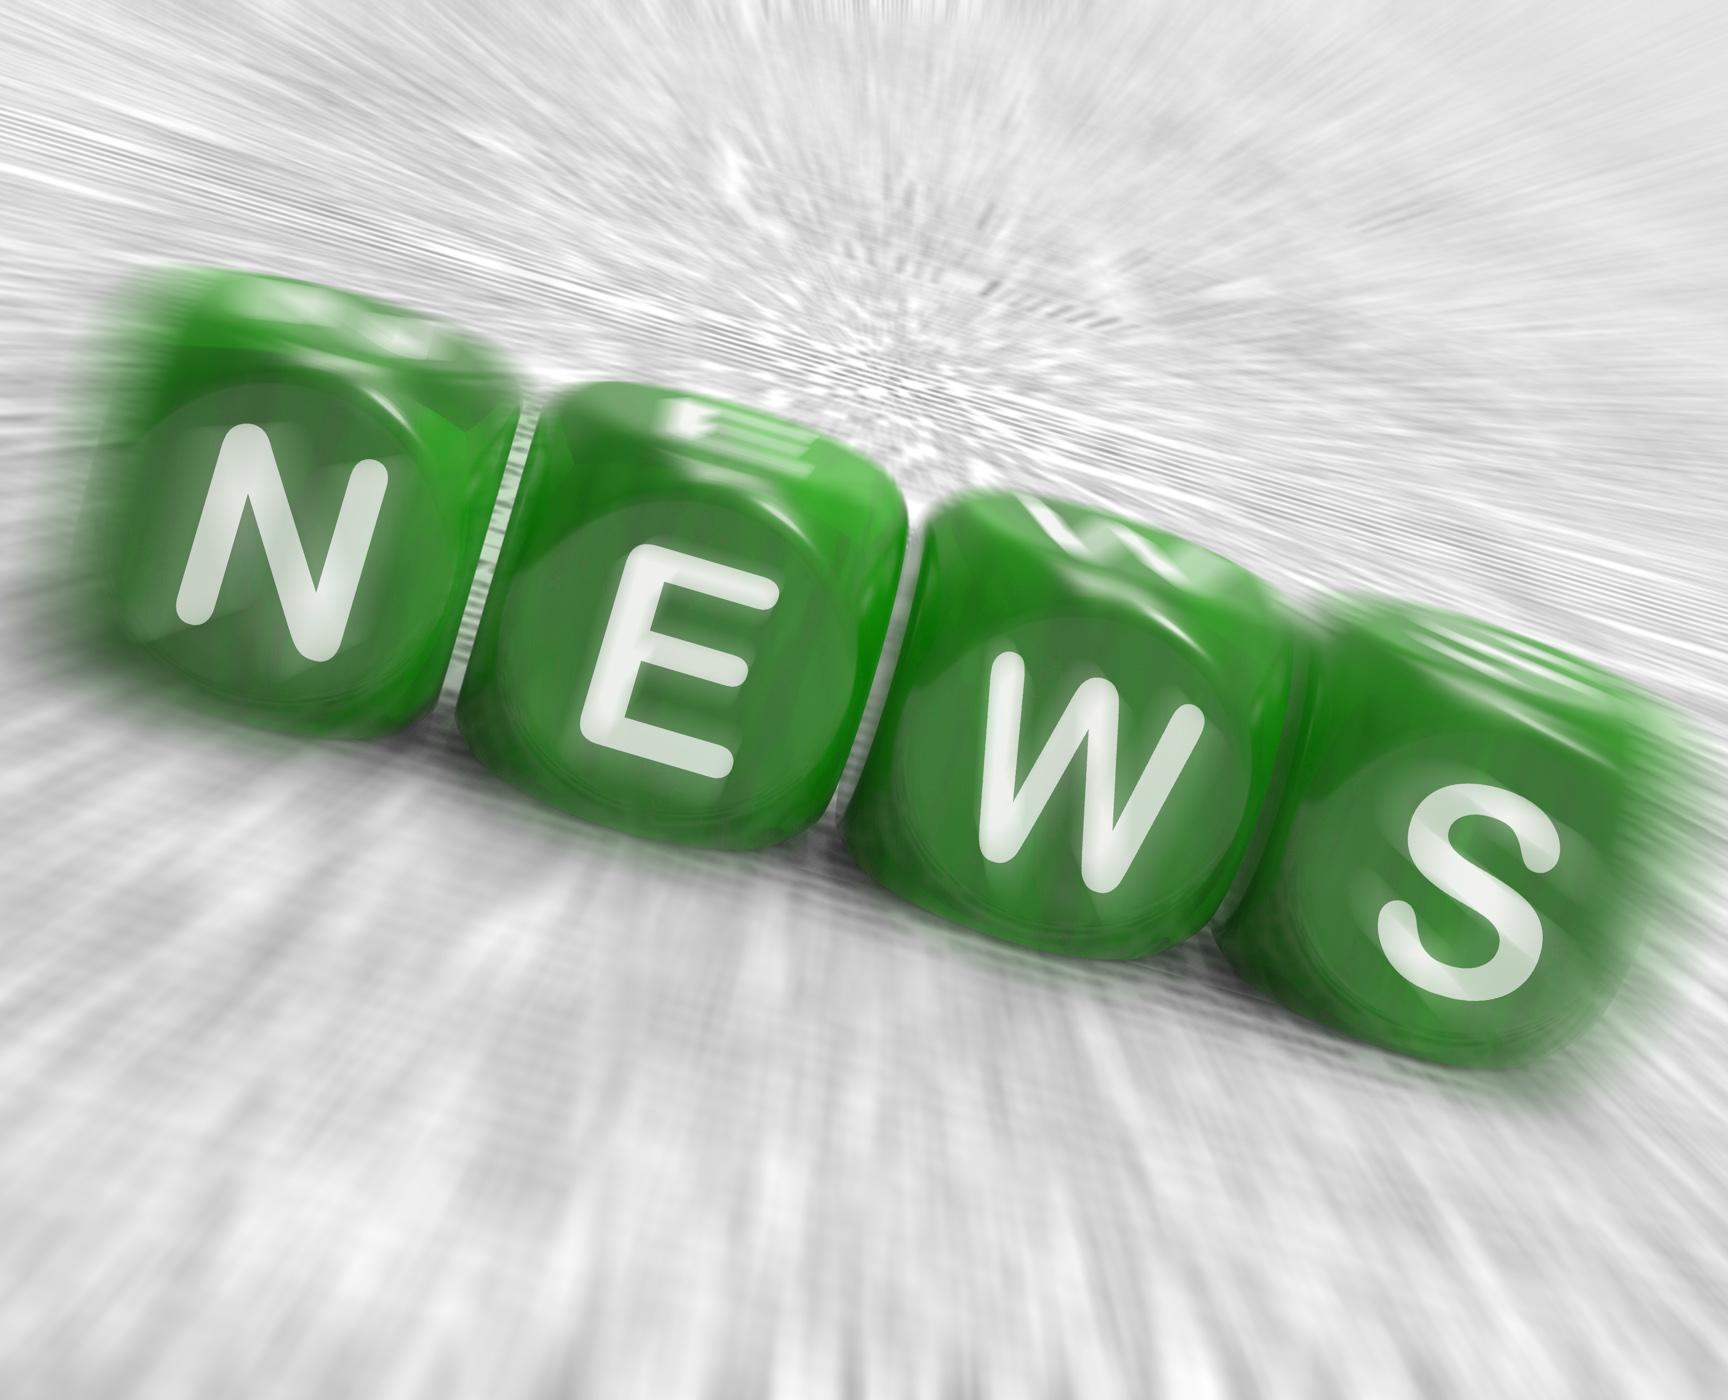 News dice displays reporting media and bulletin photo